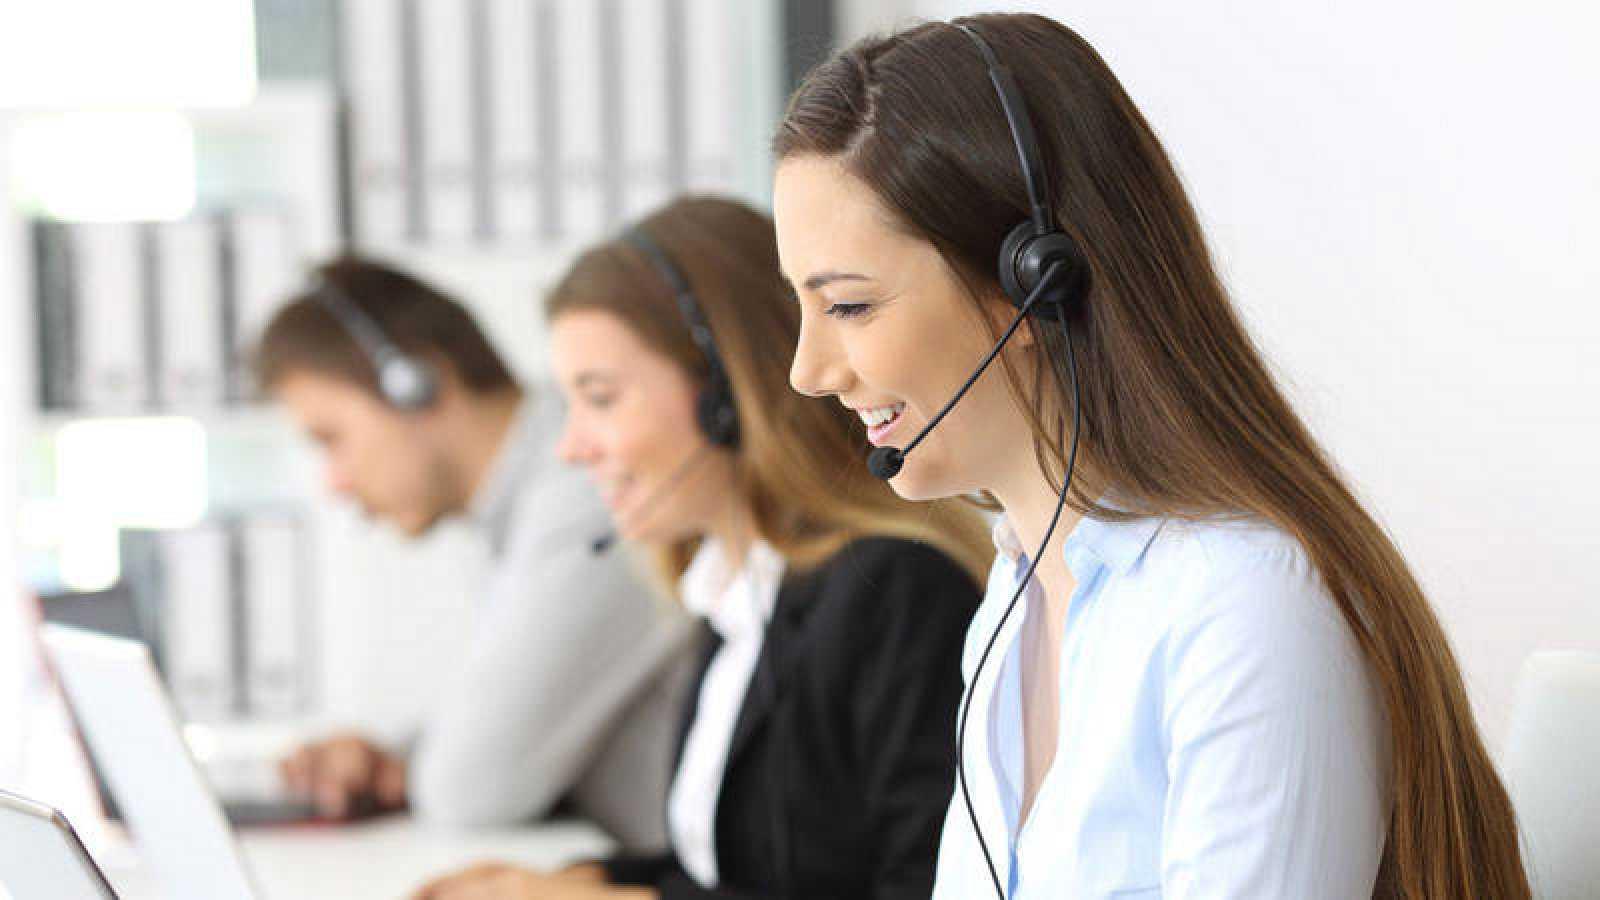 Multa de 30.000 a empresas de telemárketing por molestar a clientes